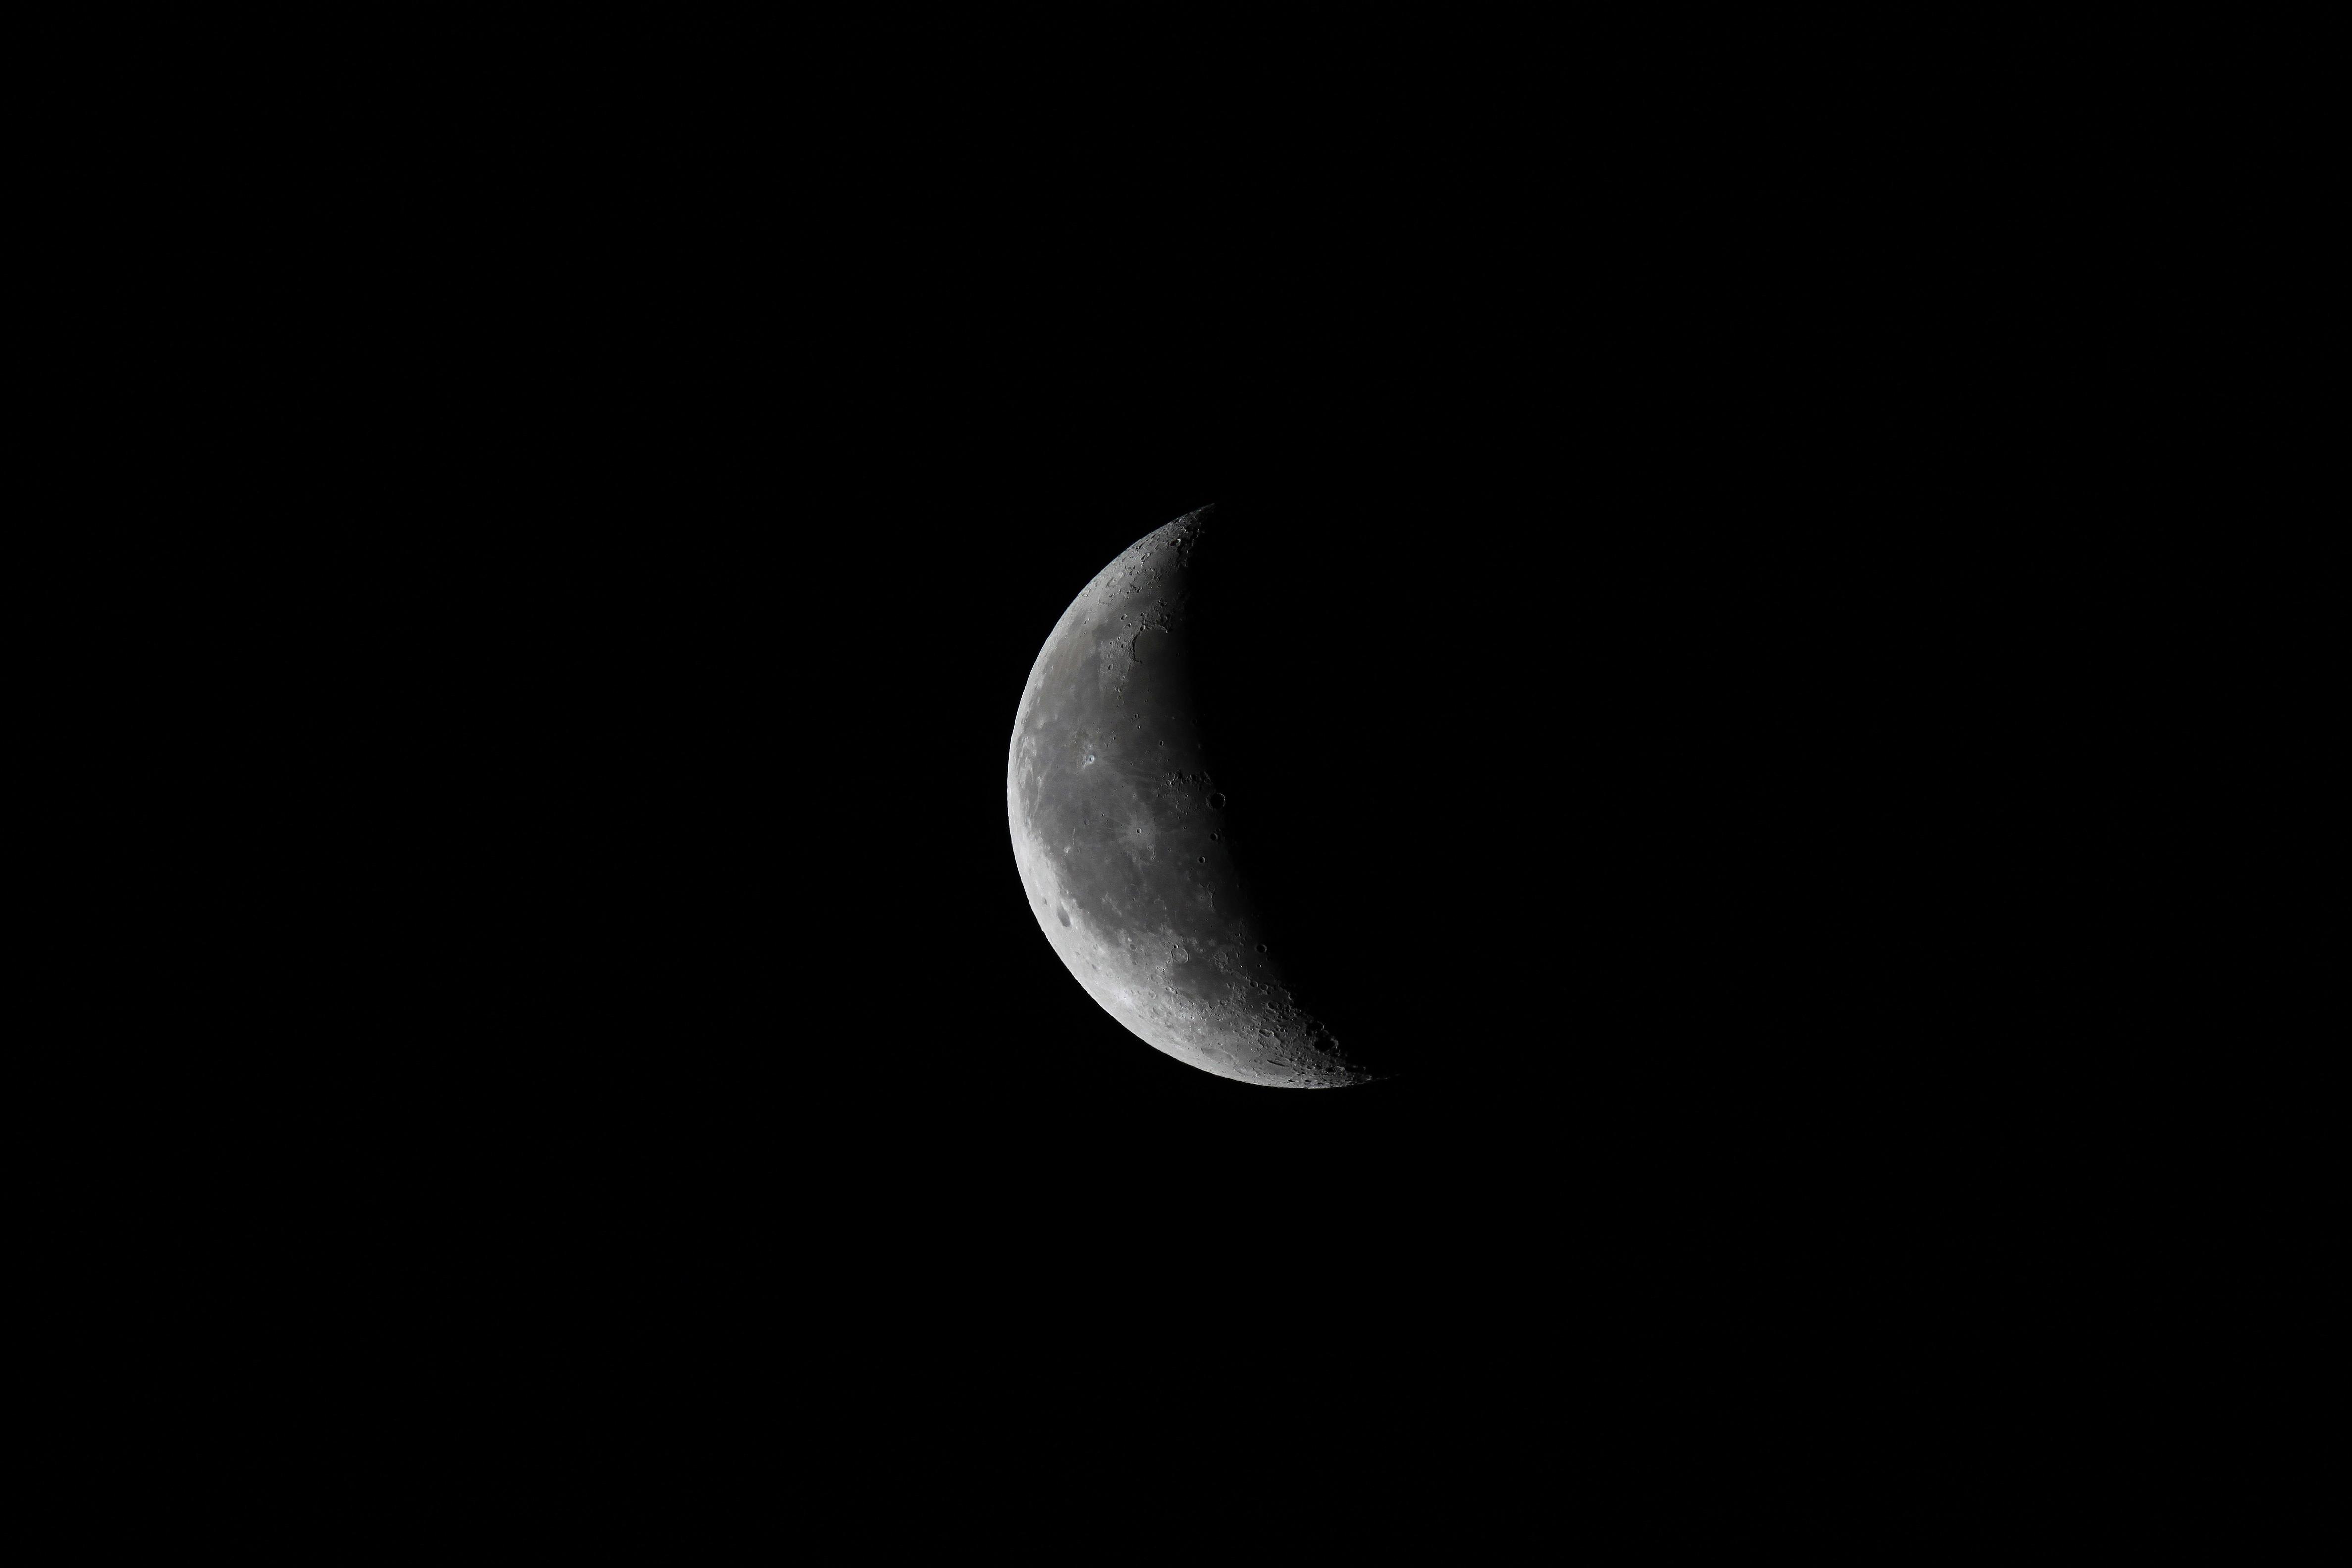 Lune (Cycle lunaire; Phase lunaire)